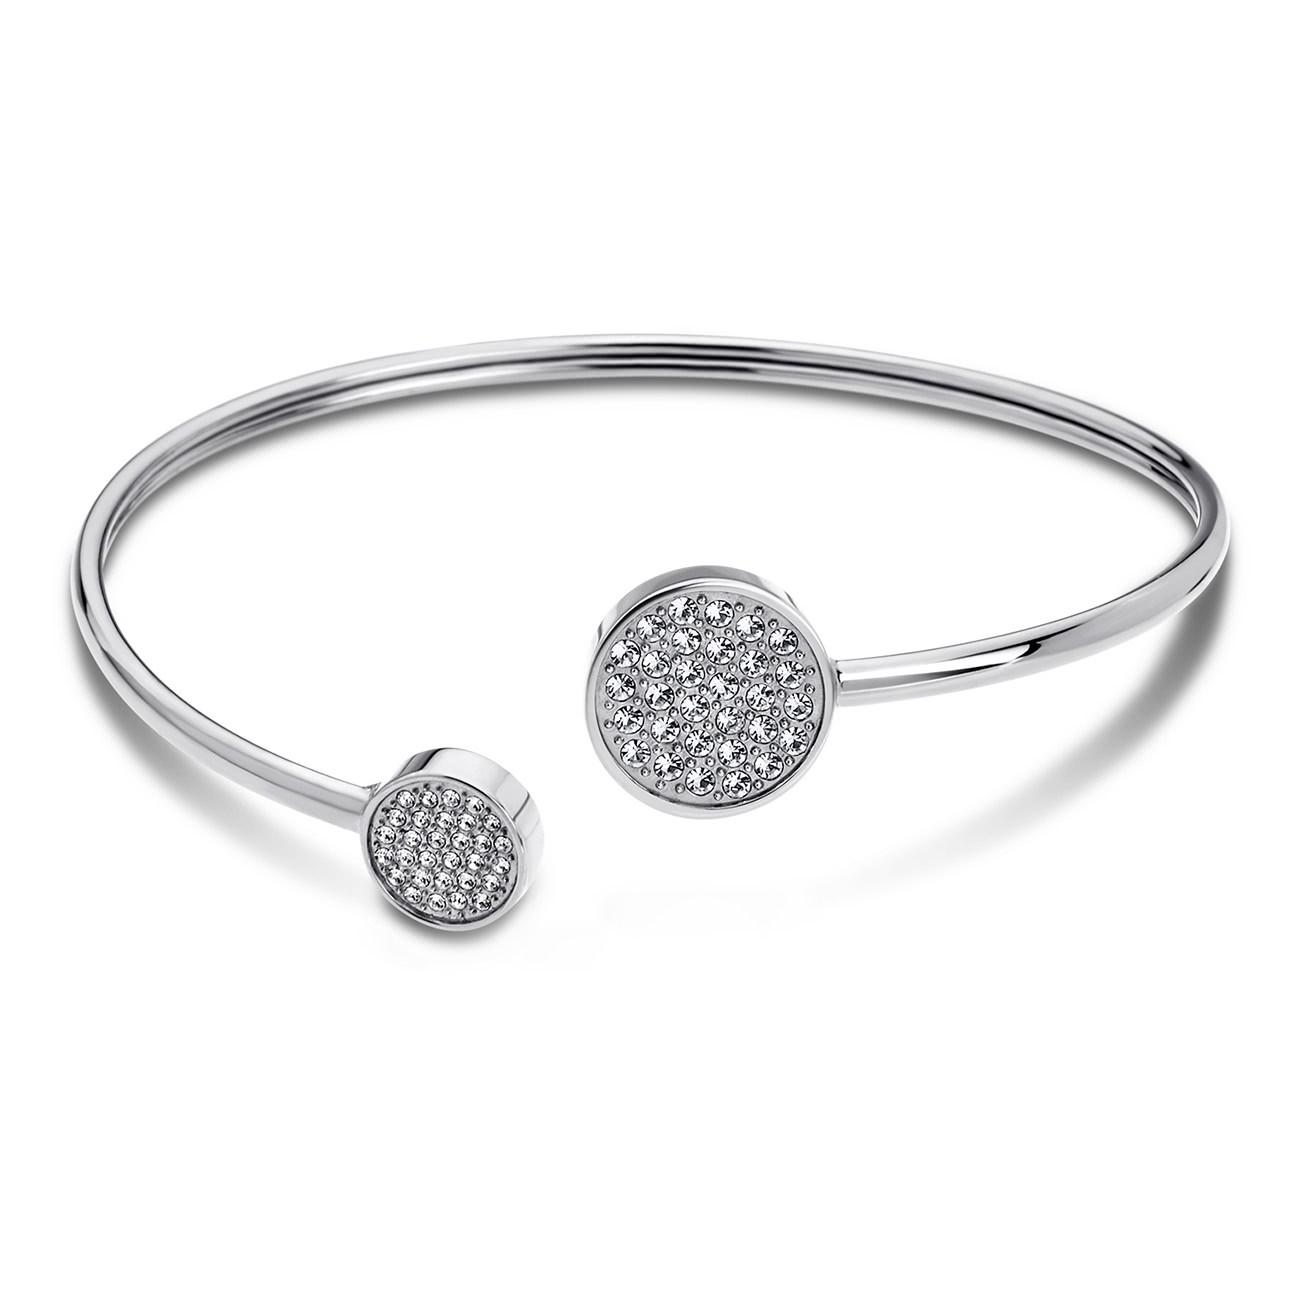 LOTUS Style Armband Damen Armreif LS1820-2/1 Edelstahl silber JLS1820-2-1